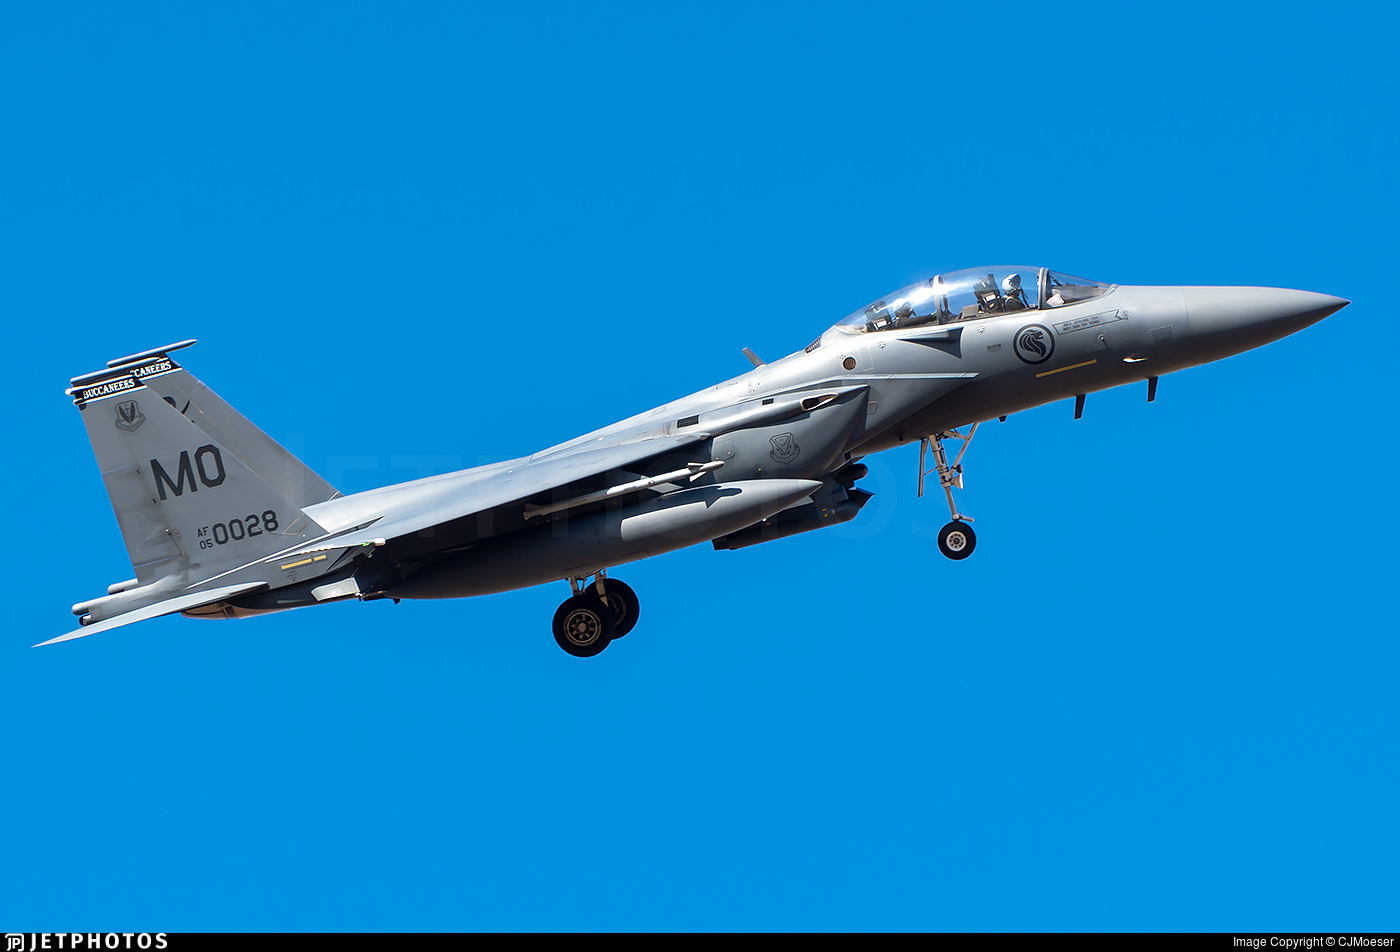 05-0028 - Boeing F-15SG Strike Eagle - Singapore - Air Force